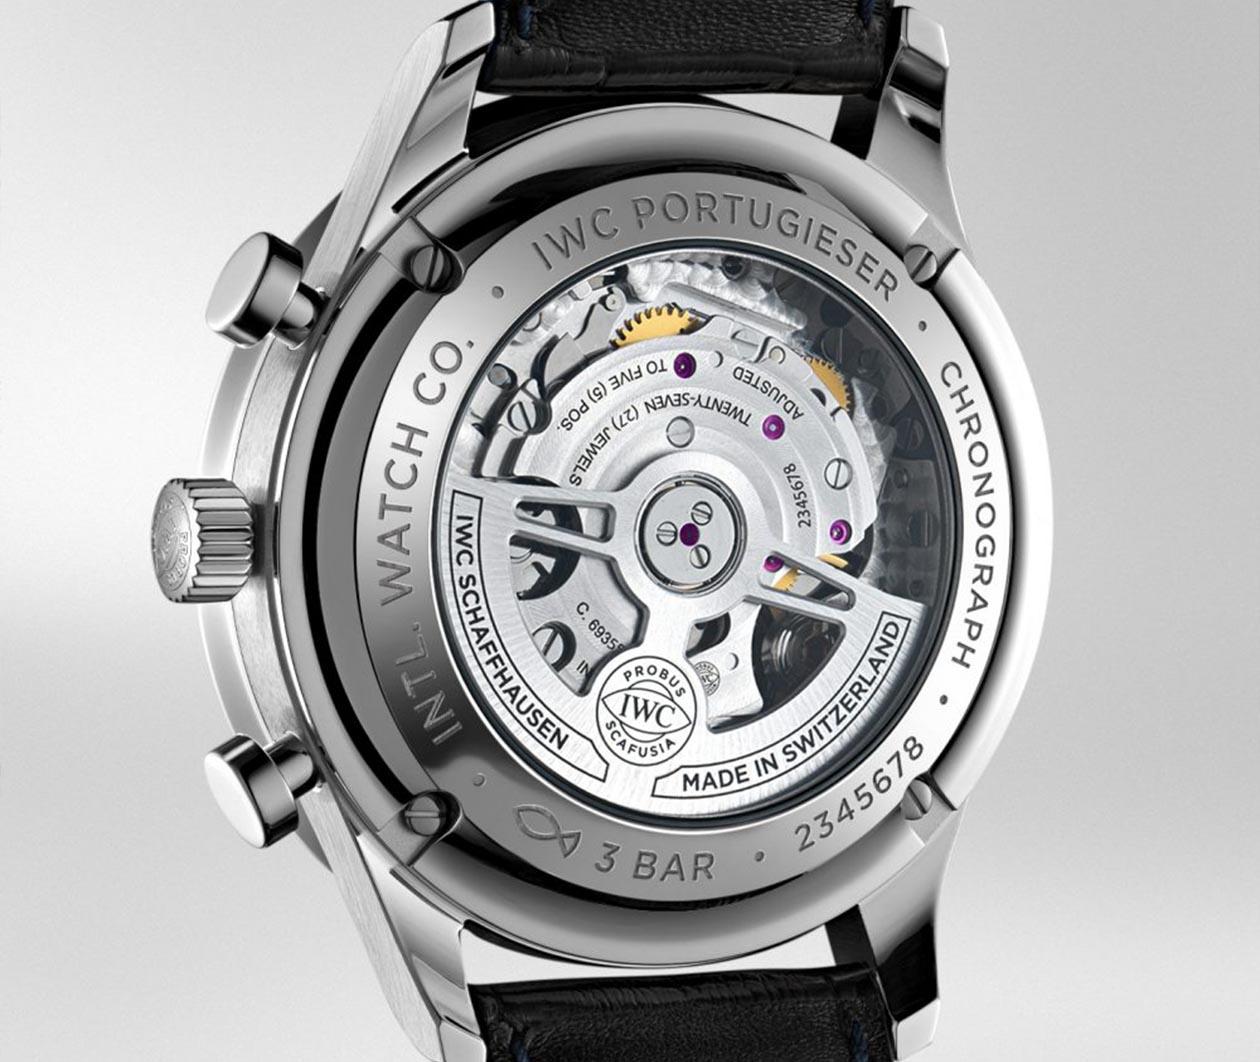 IWC Portugieser Chronograph IW371605 Carousel 5 FINAL